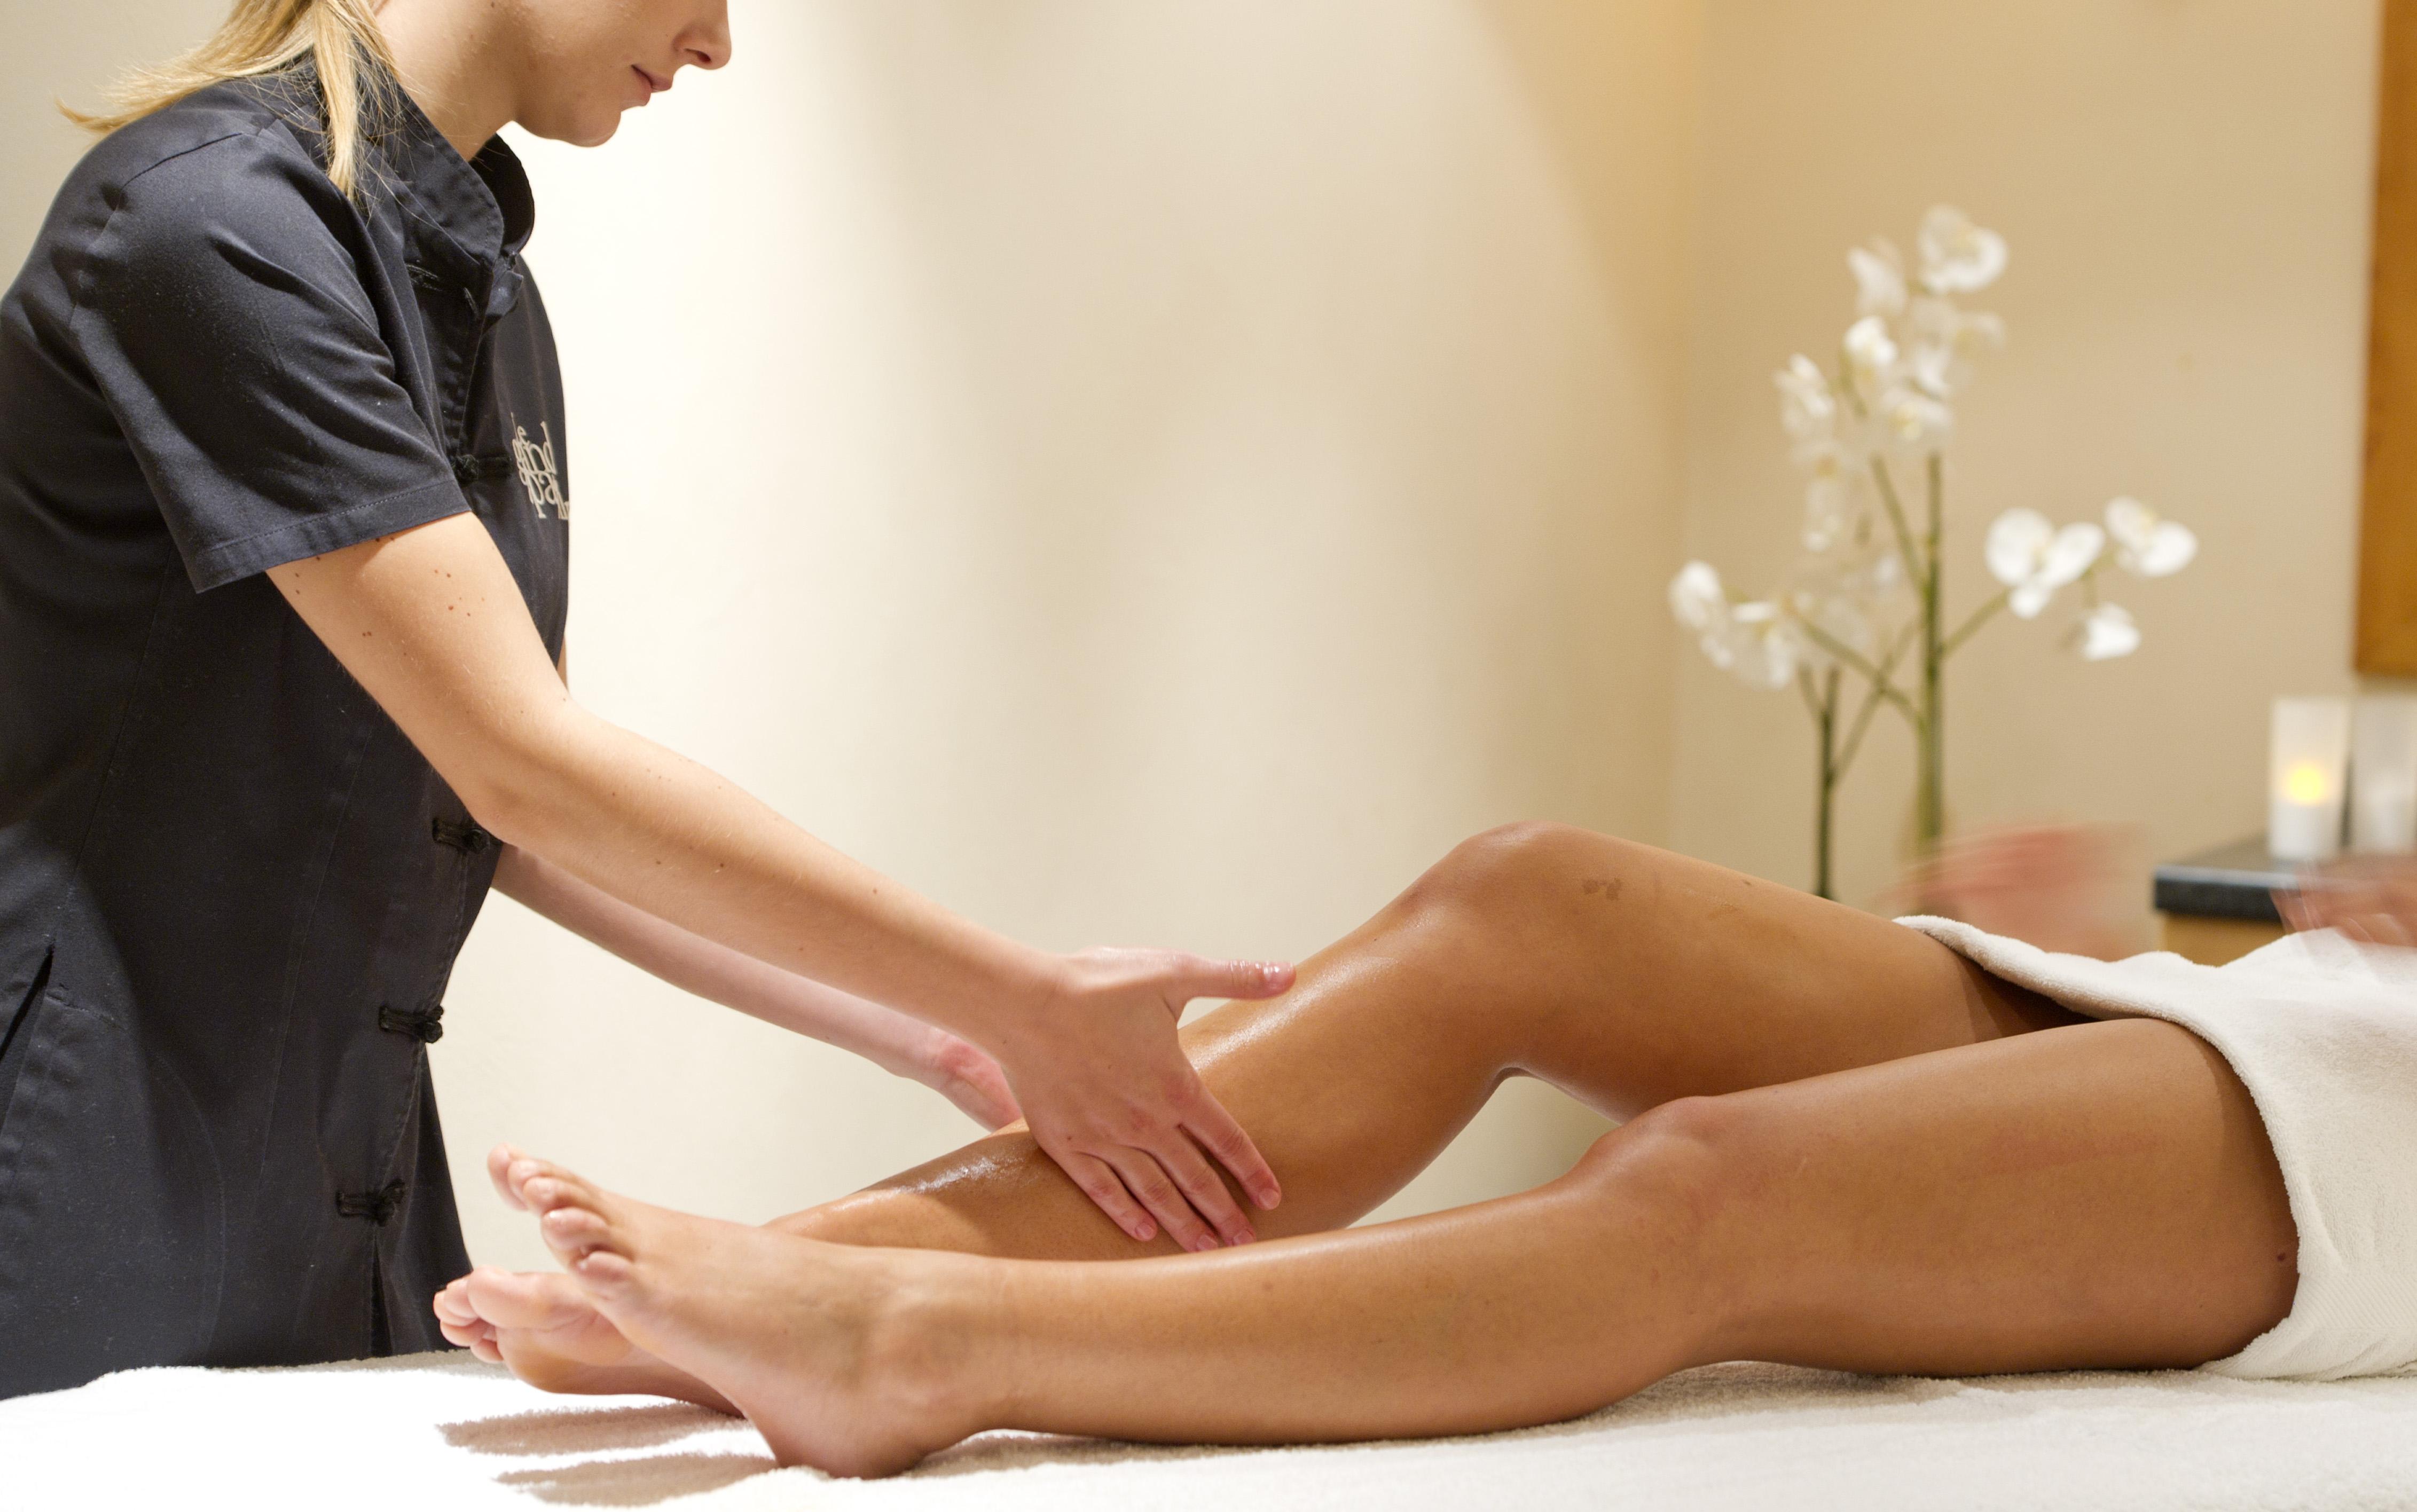 Massage - S.Kempinaire